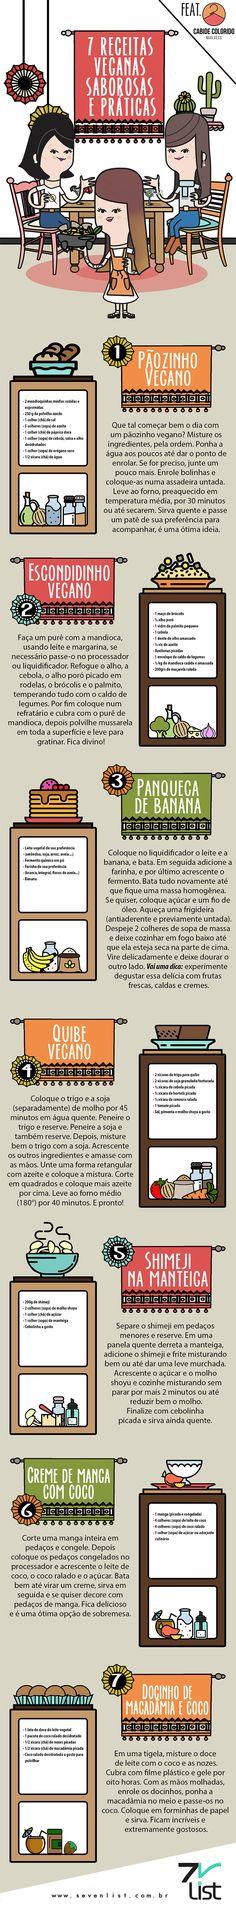 7 receitas veganas saborosas e práticas – Cabide Colorido por Michelle Alves